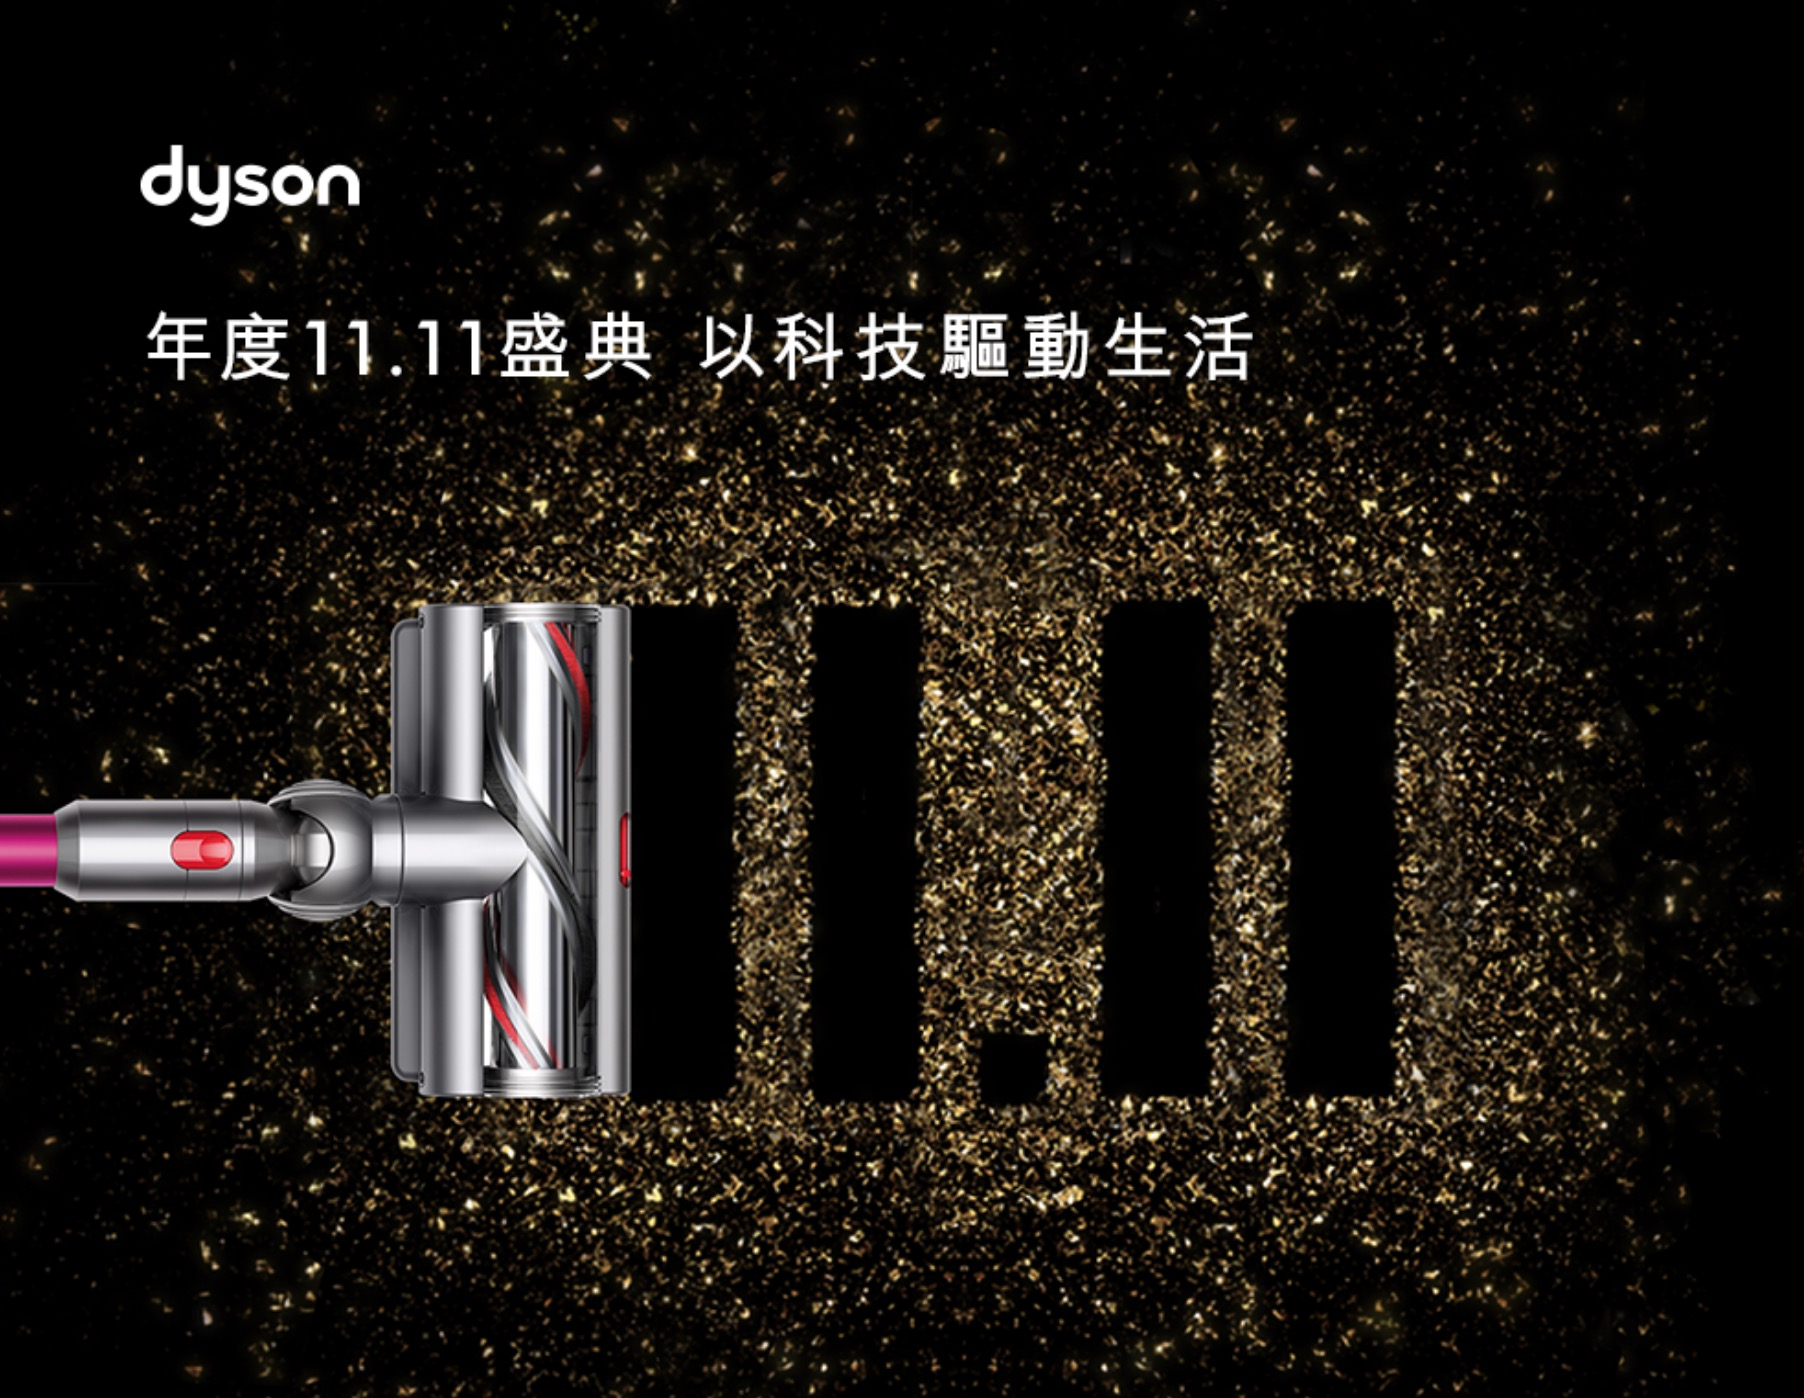 Dyson祭出絕對有感超值優惠,旗下熱賣的無線吸塵器、空氣清淨機、吹風機分別推出官網獨家